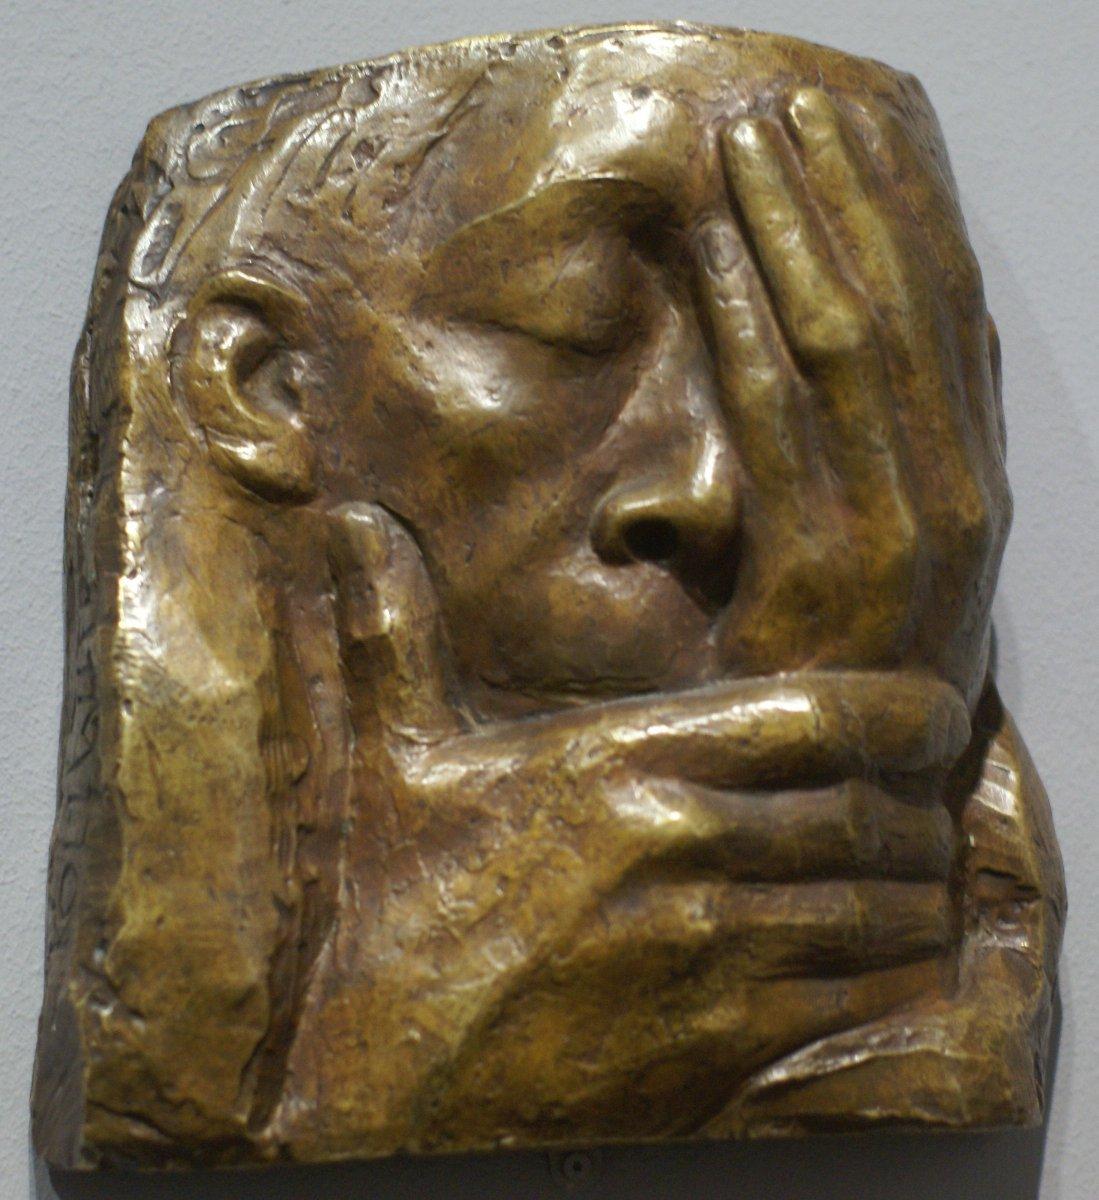 Kathe Kollwitz. Lamentation: In Memory of Ernst Barlach. 1938.